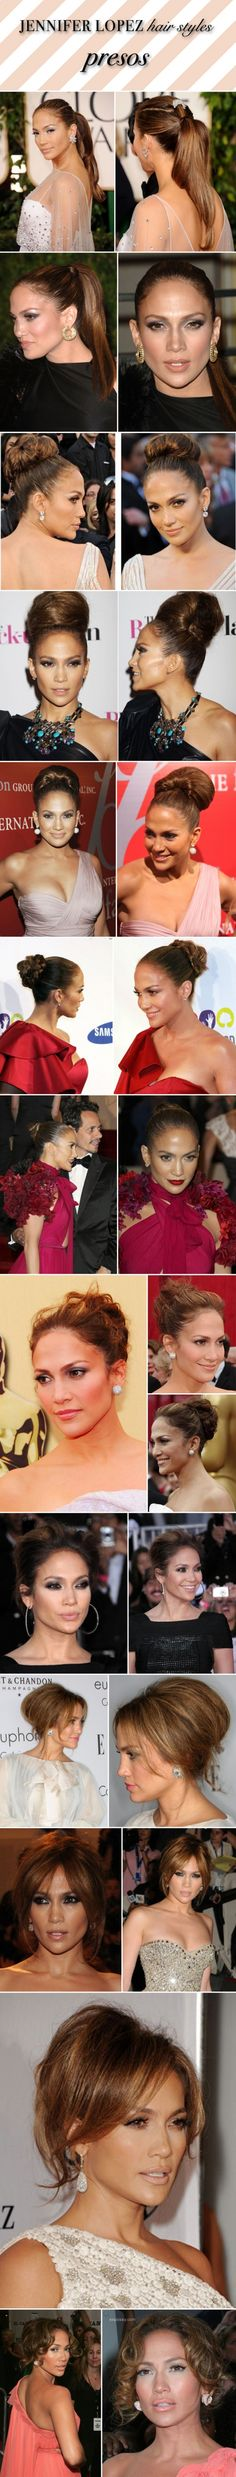 jennifer lopez hair style red carpet